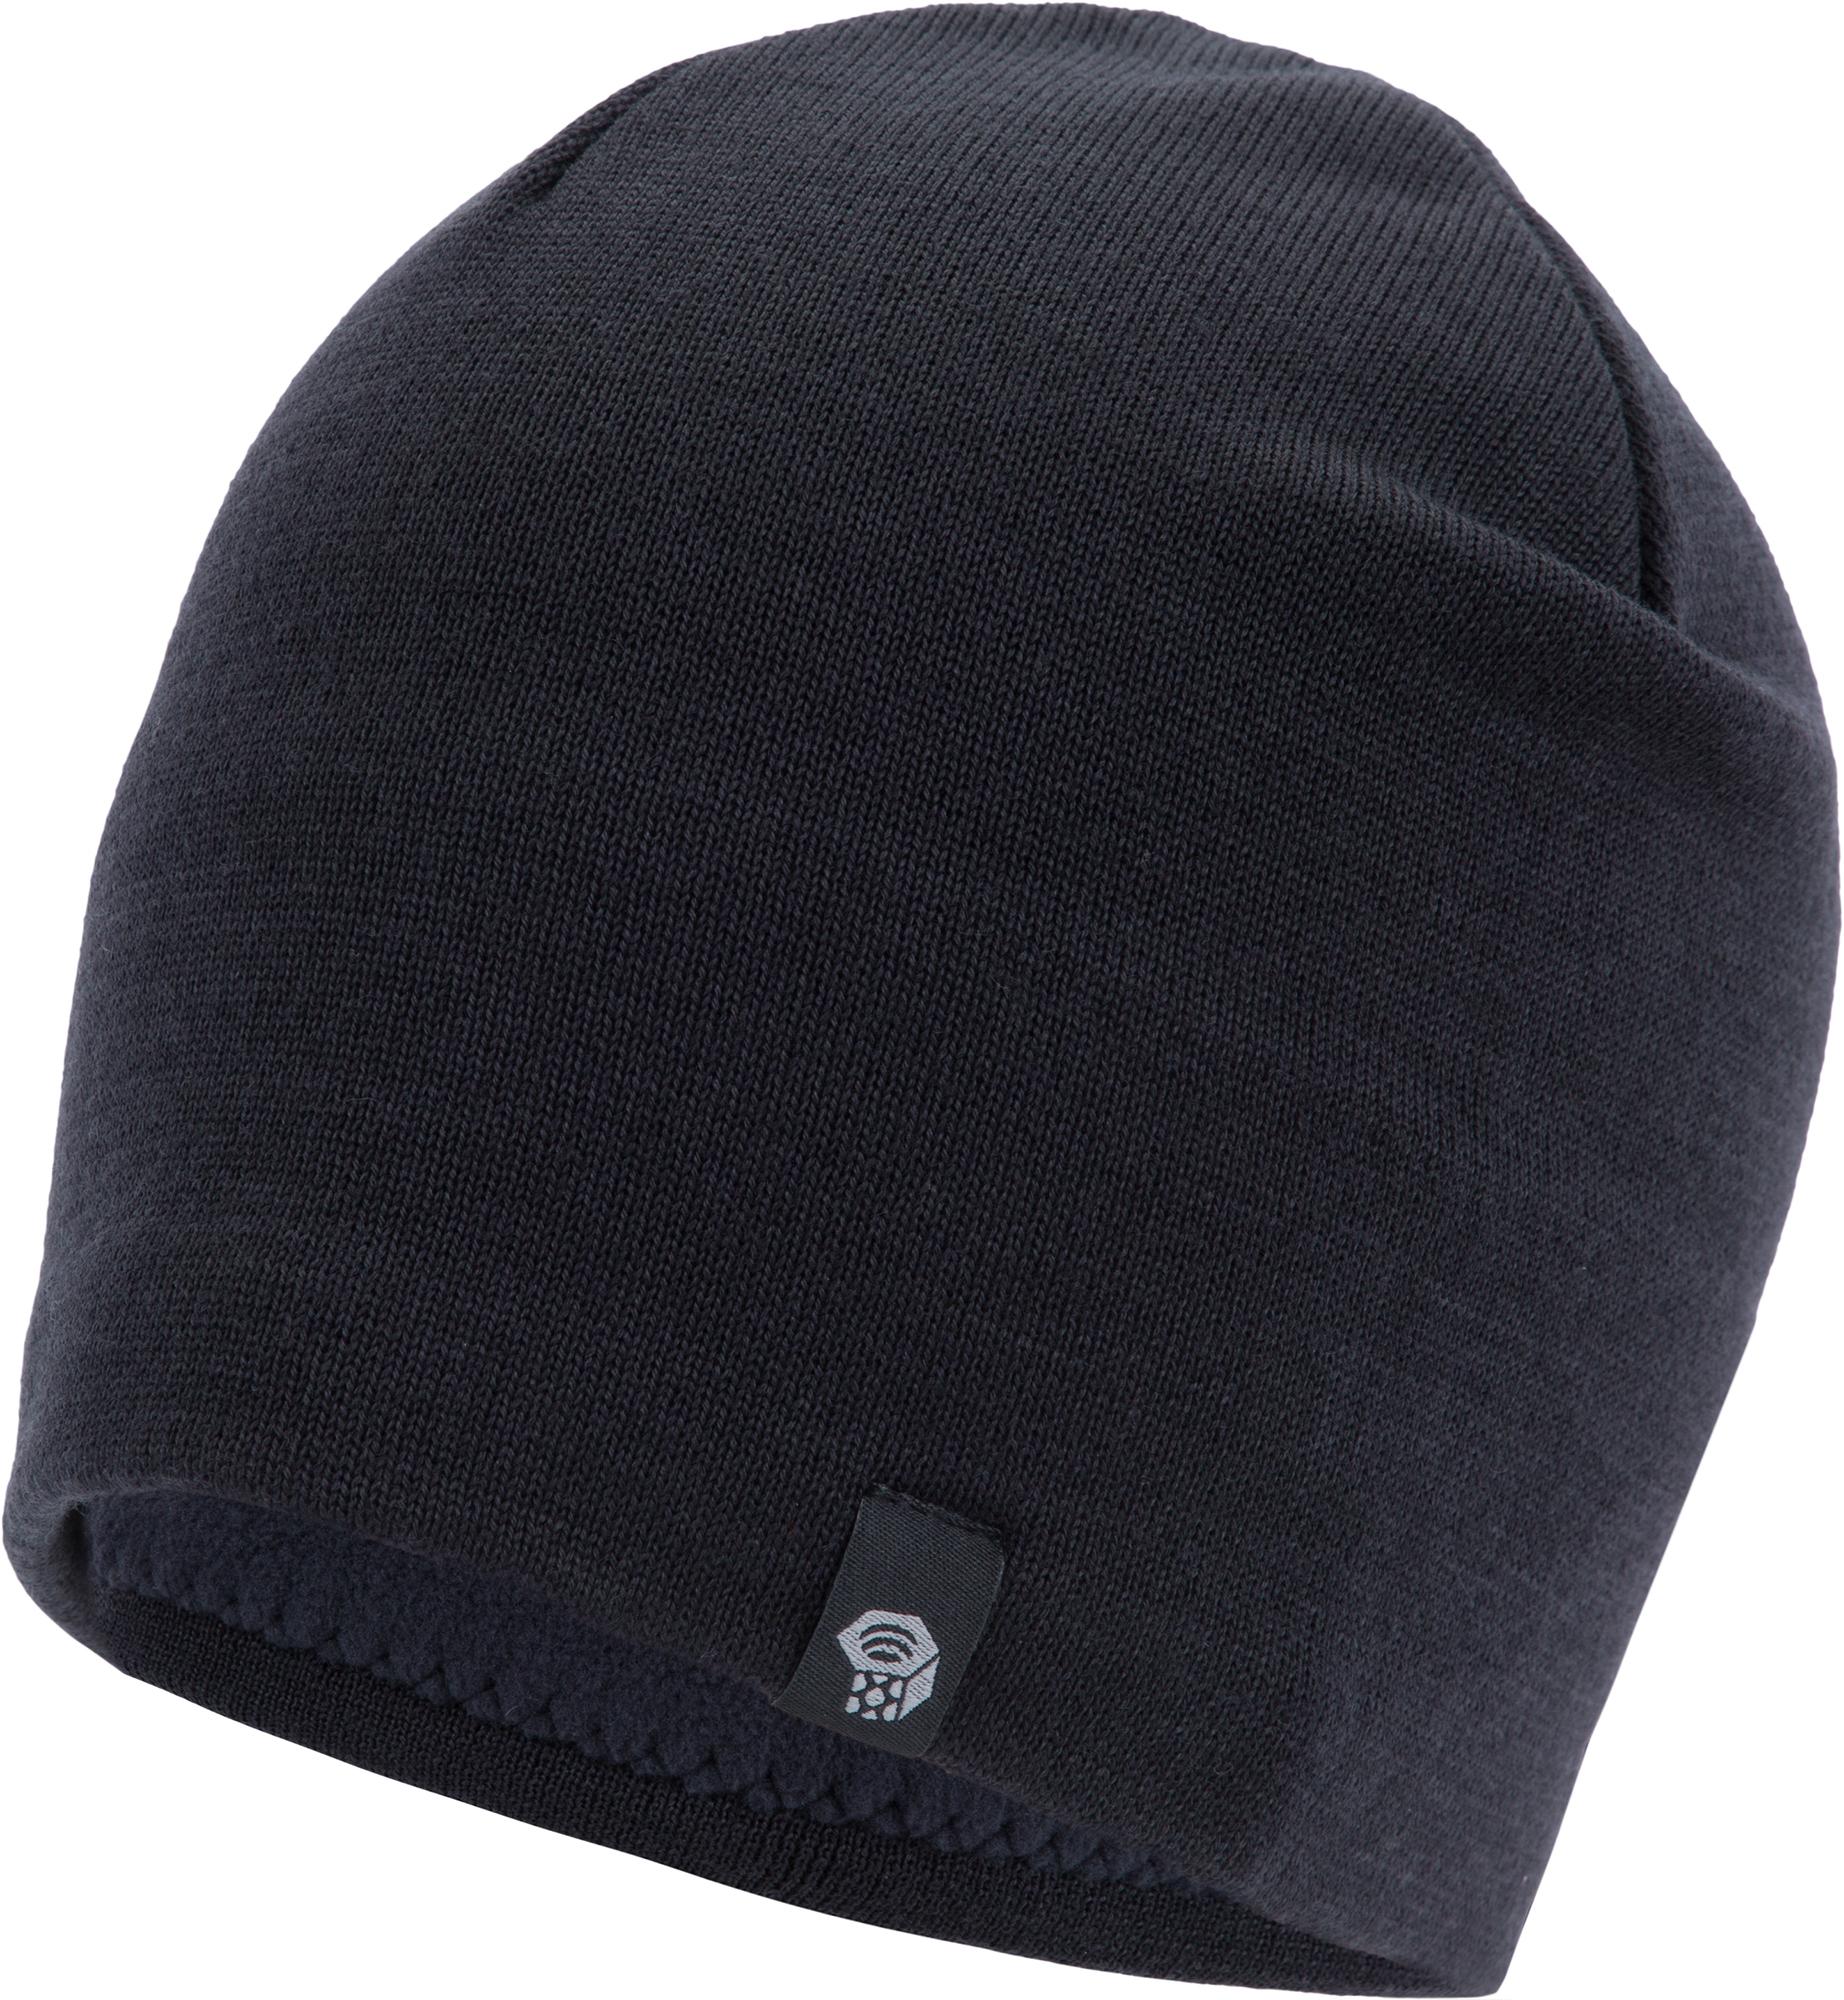 Mountain Hardwear Шапка мужская Mountain Hardwear Caelum™ Dome, размер 46-48 цены